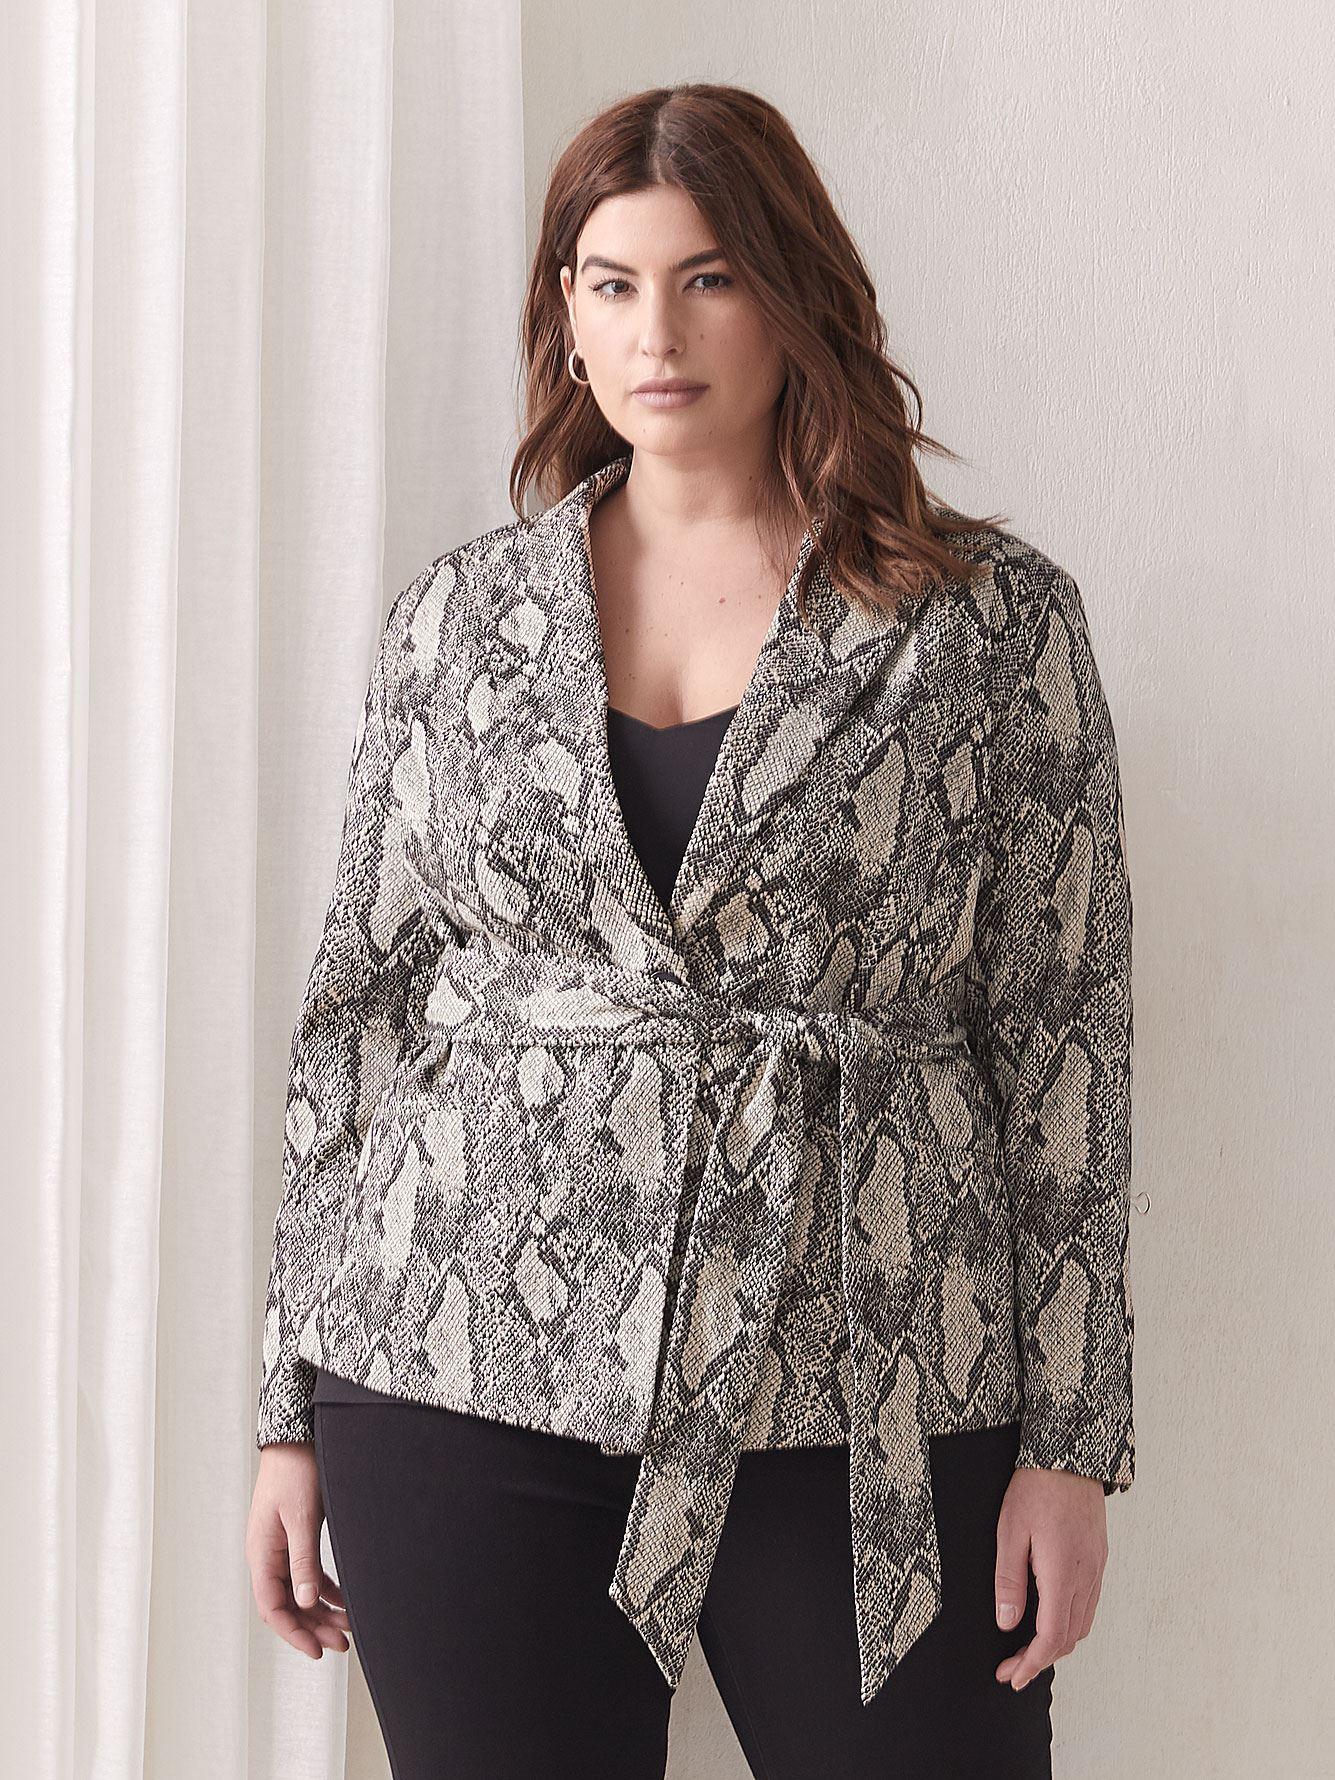 Snakeskin Print Sash-Belted Blazer - RACHEL Rachel Roy